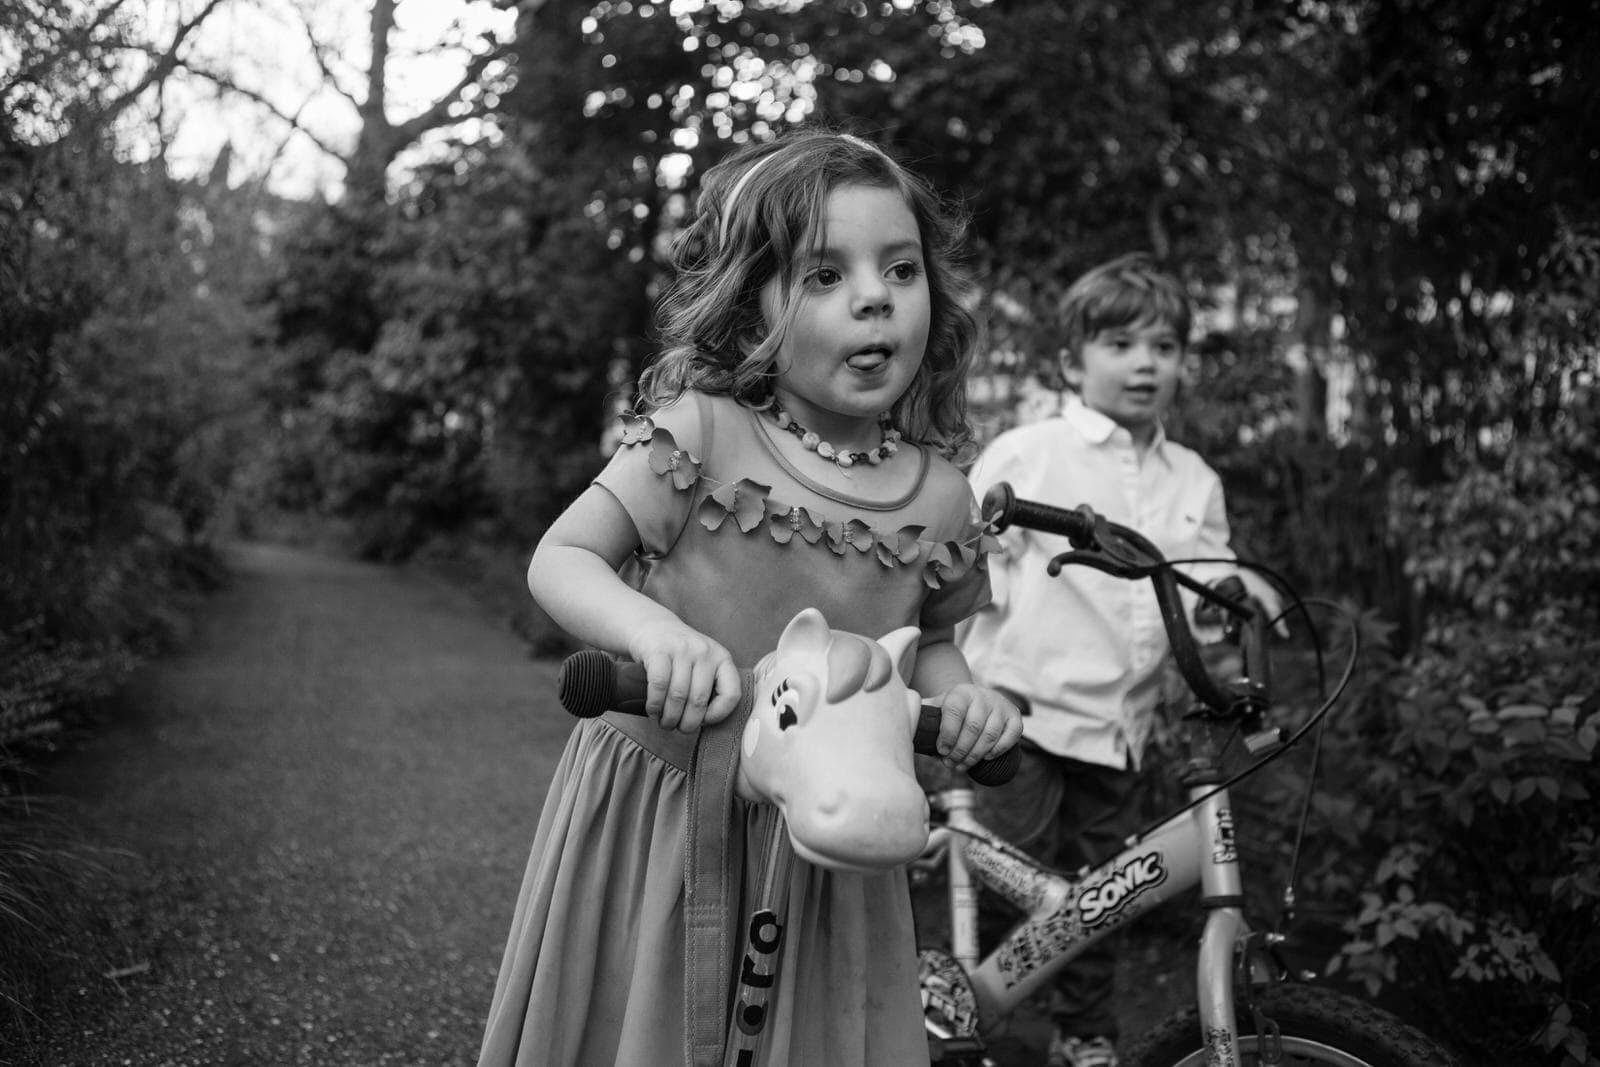 kensington-day-in-the-life-documentary-family-photographs-0153